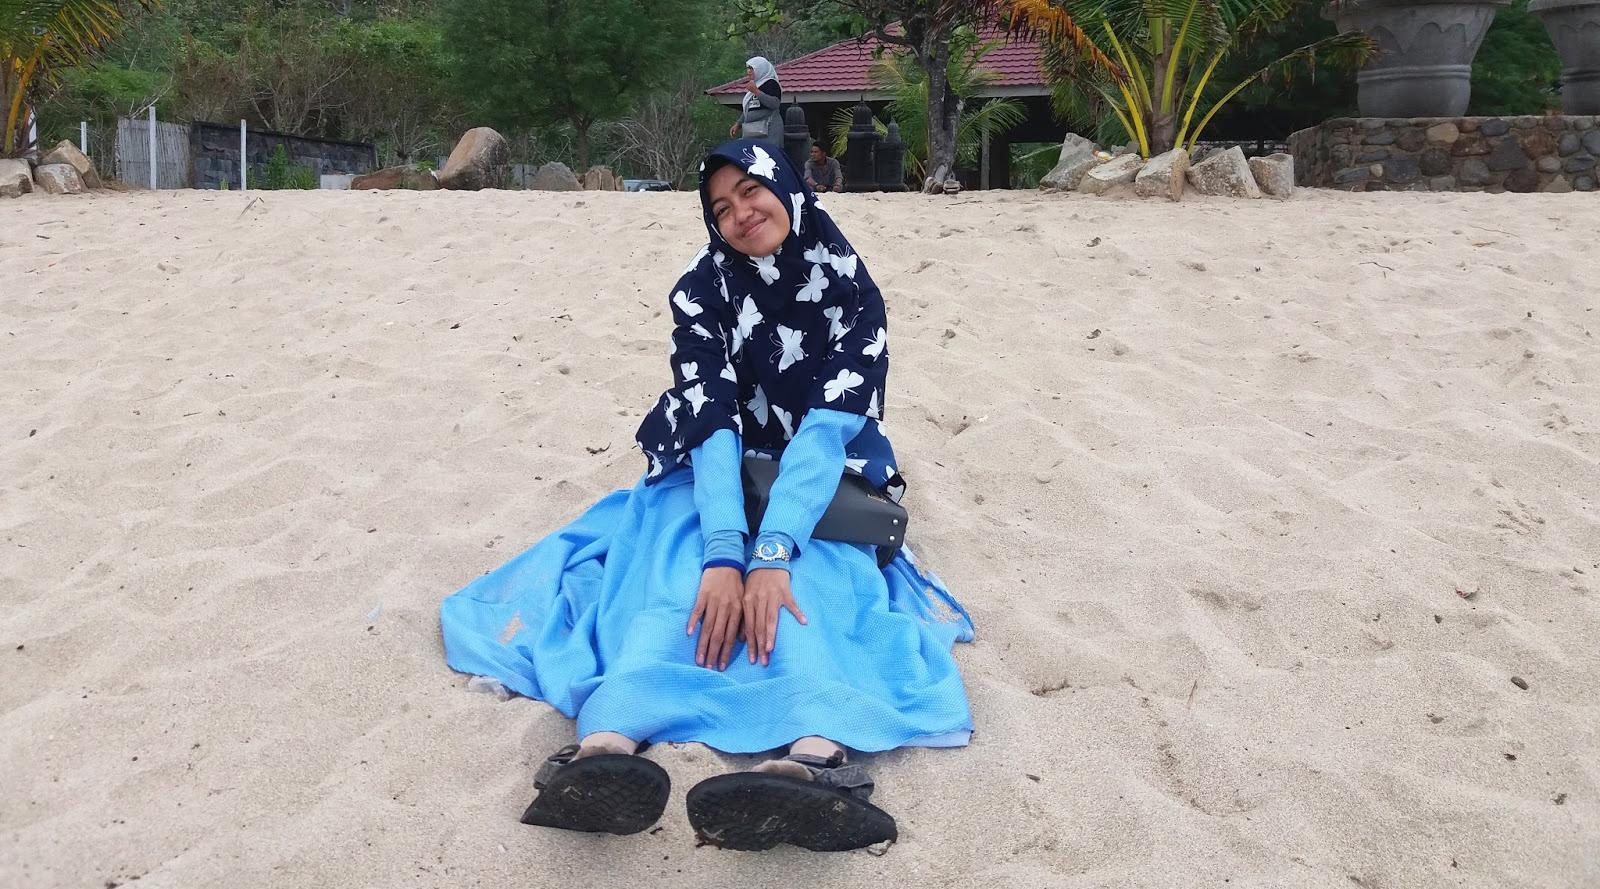 Alda Henidar Yuristia - Wisata ke Pantai Wane Nusa Tenggara Barat